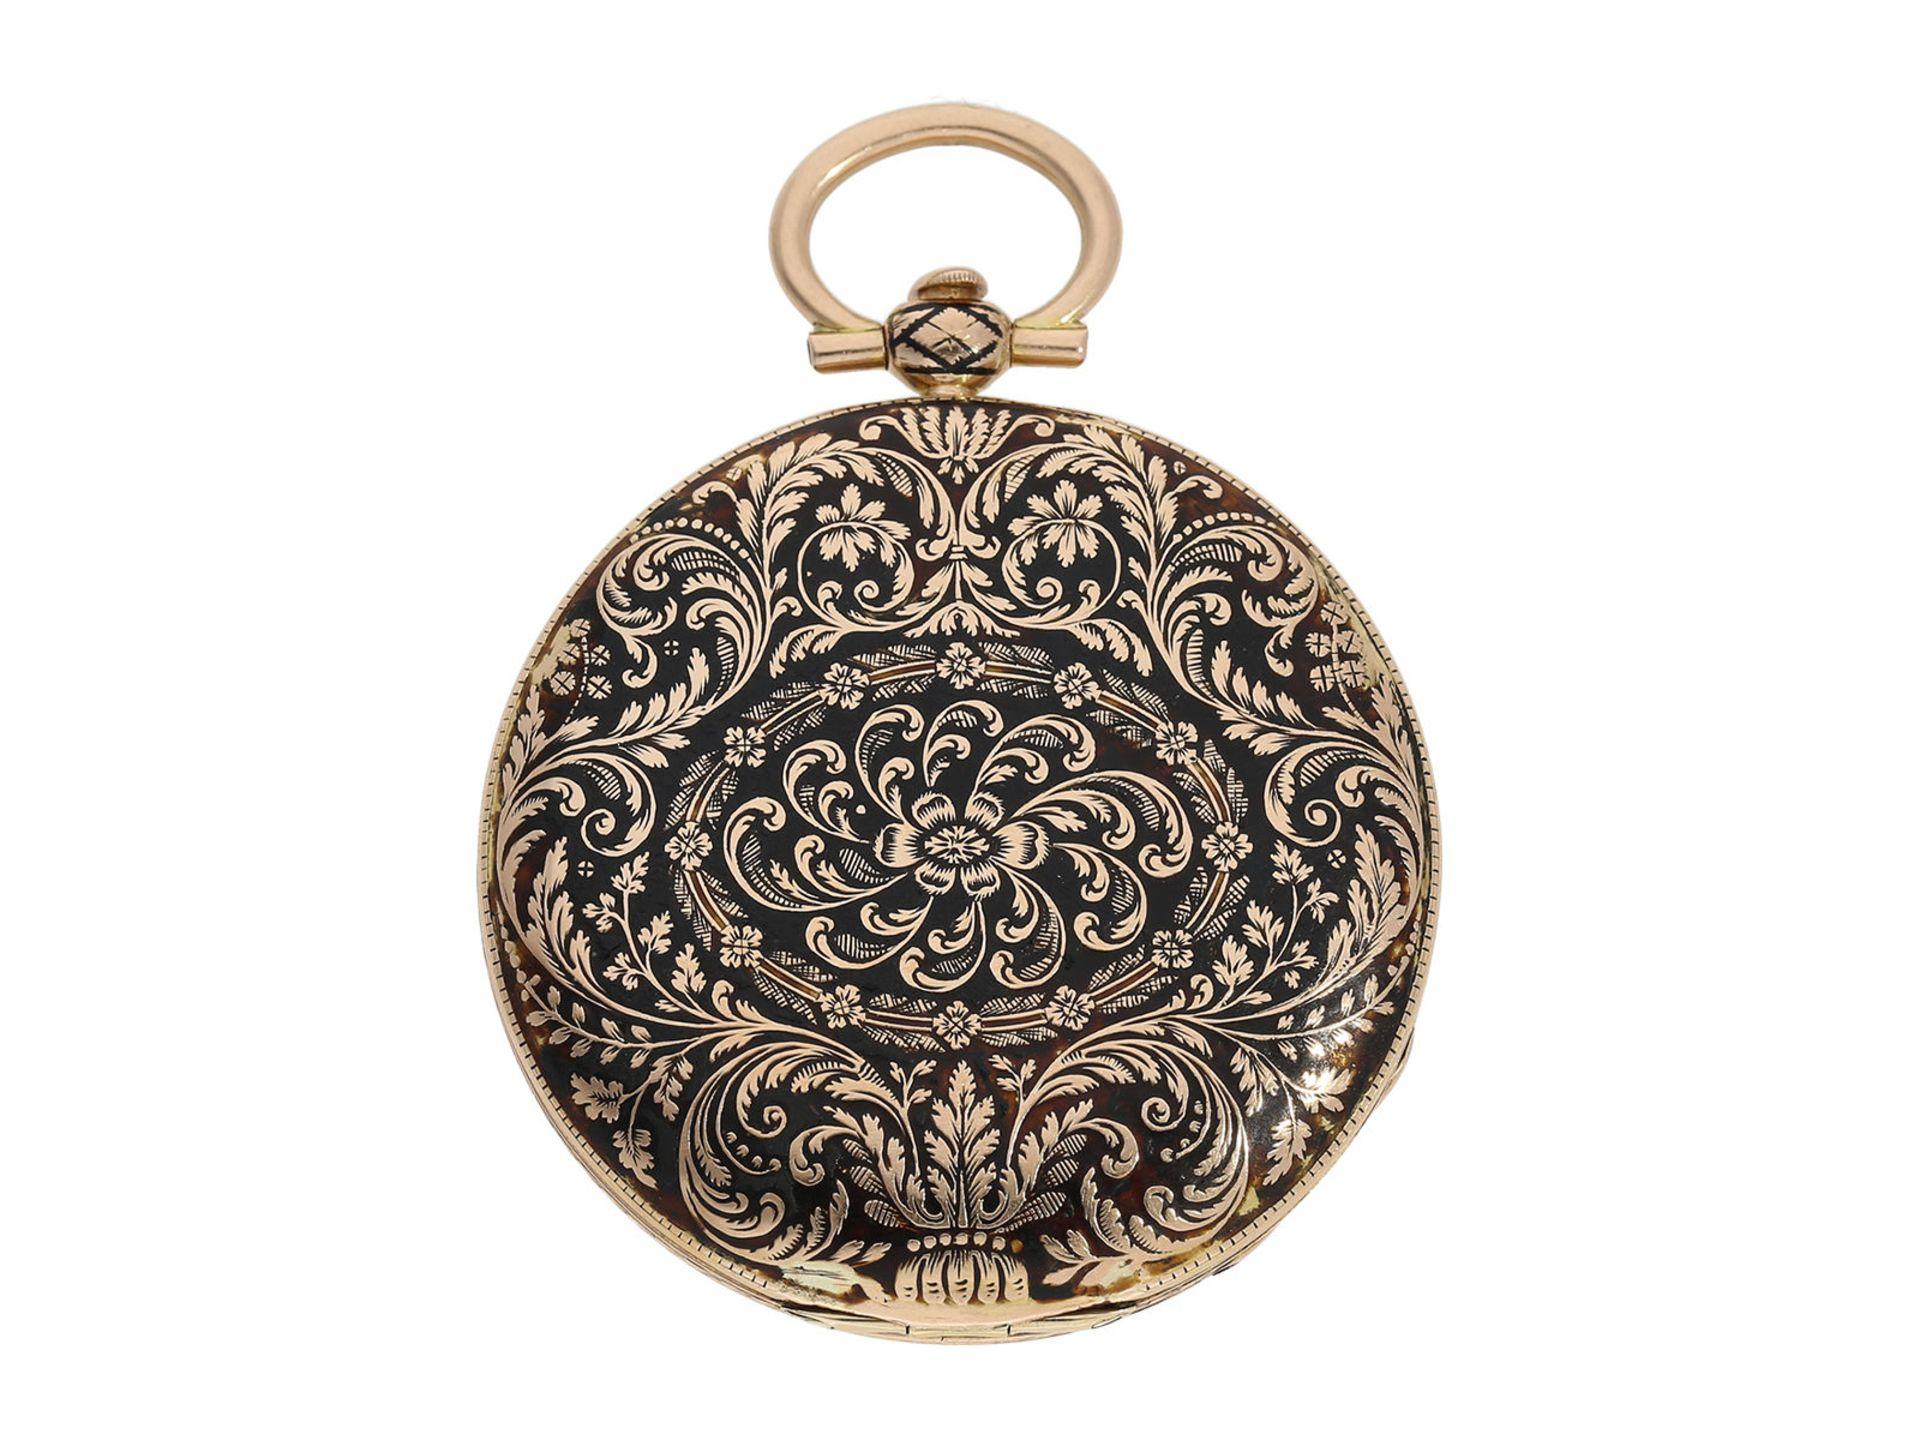 Pocket watch: magnificent gold/ enamel Lepine with rare case decoration and repeater, fine calibre - Bild 5 aus 7